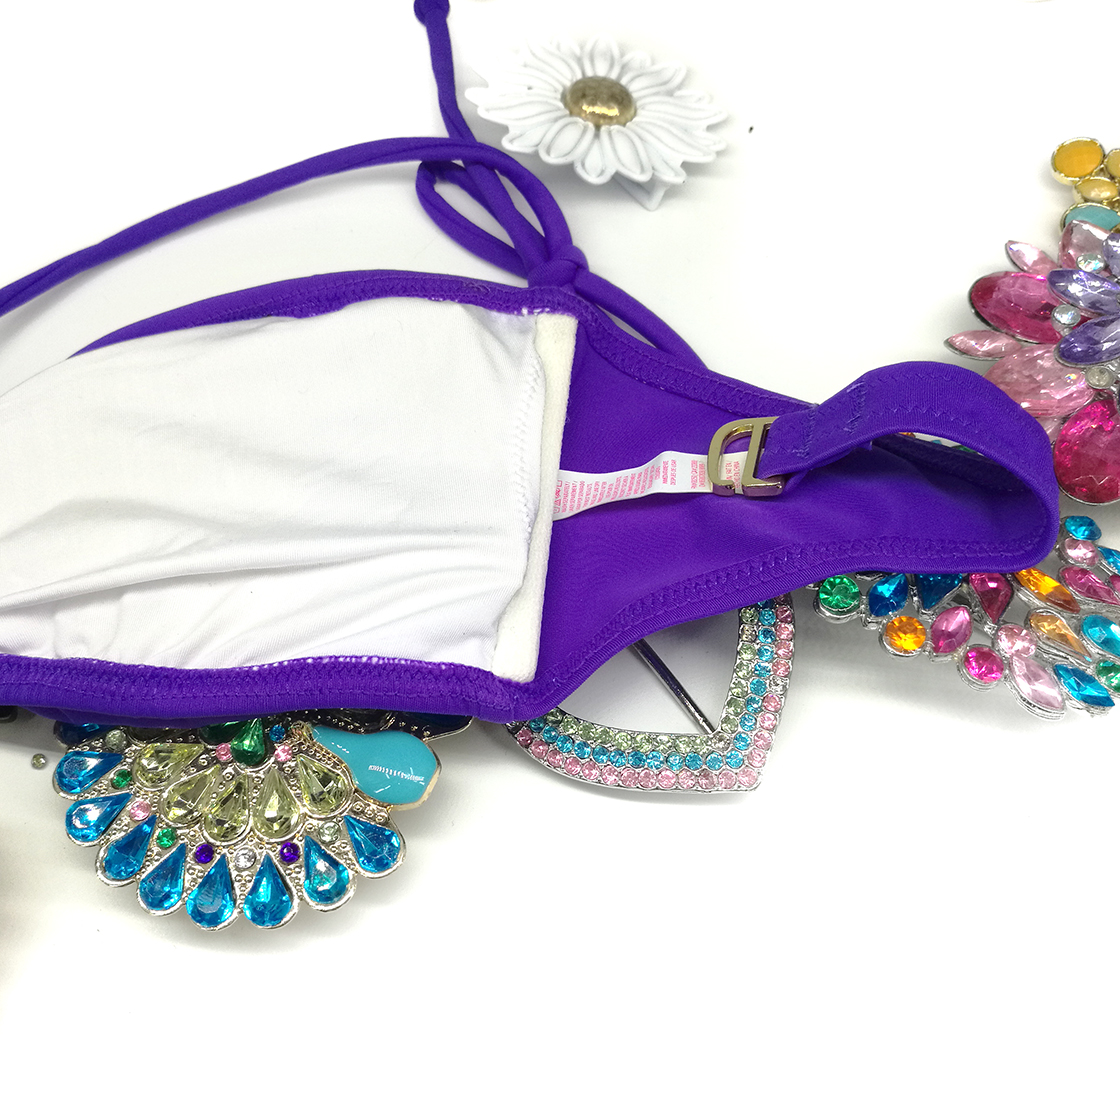 Mixer Bikini TOPS for Women Swimwear Top Original Design For Secret Diamond Purple Bathing suits Sexy swimming biquini UP 1